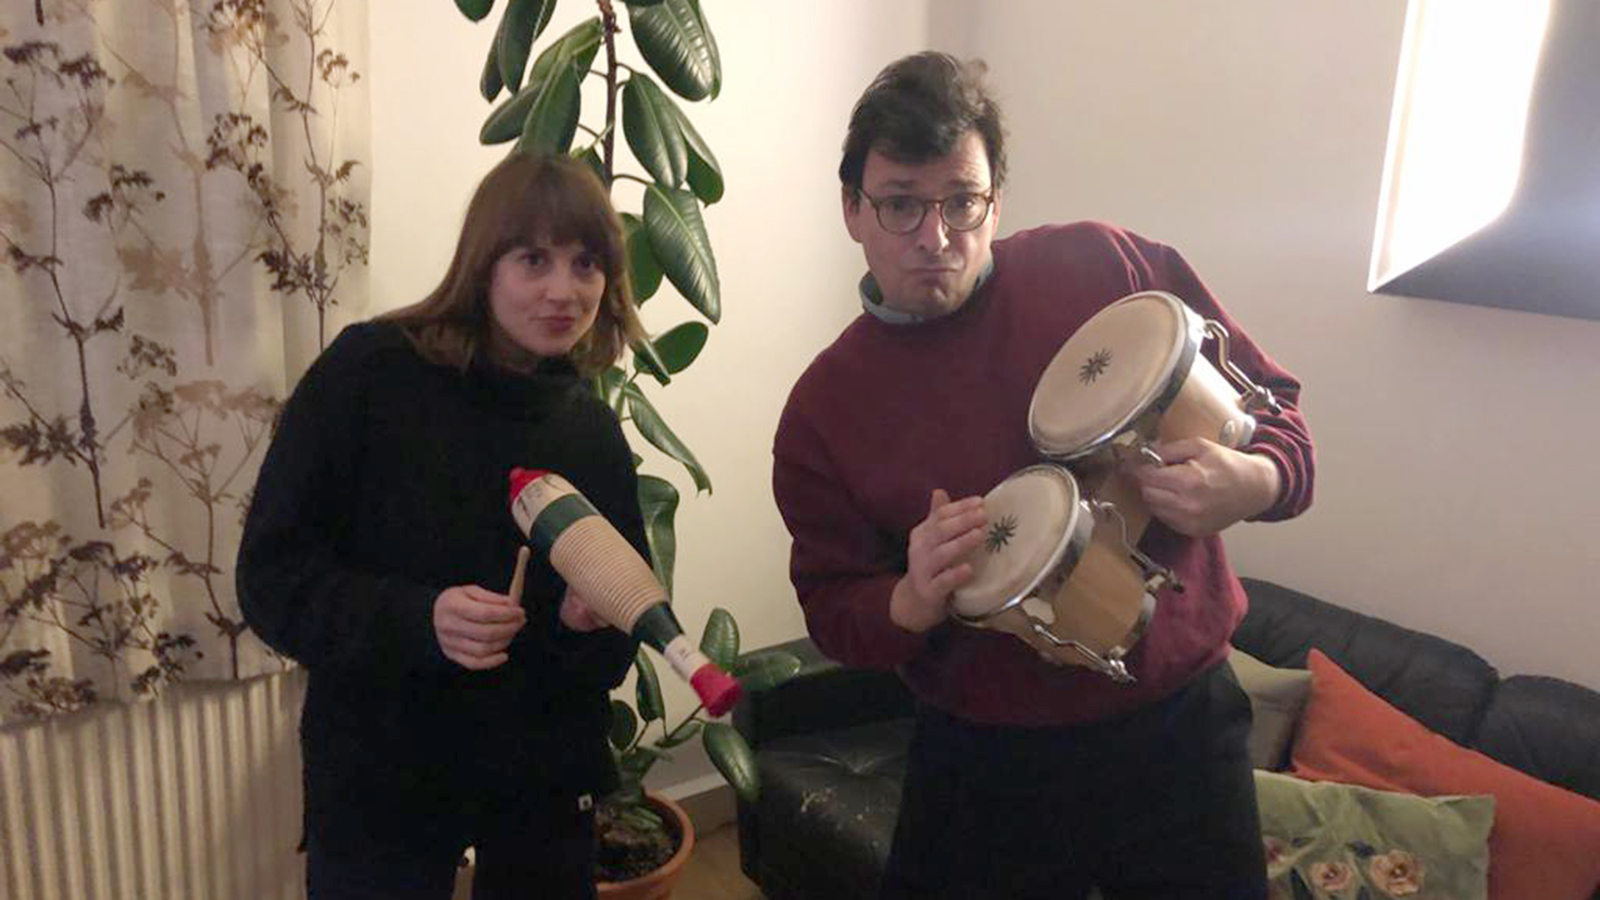 Ksdhfjkdhfkhw w/ Ana Helder & Pascal Schäfer (January 2021)